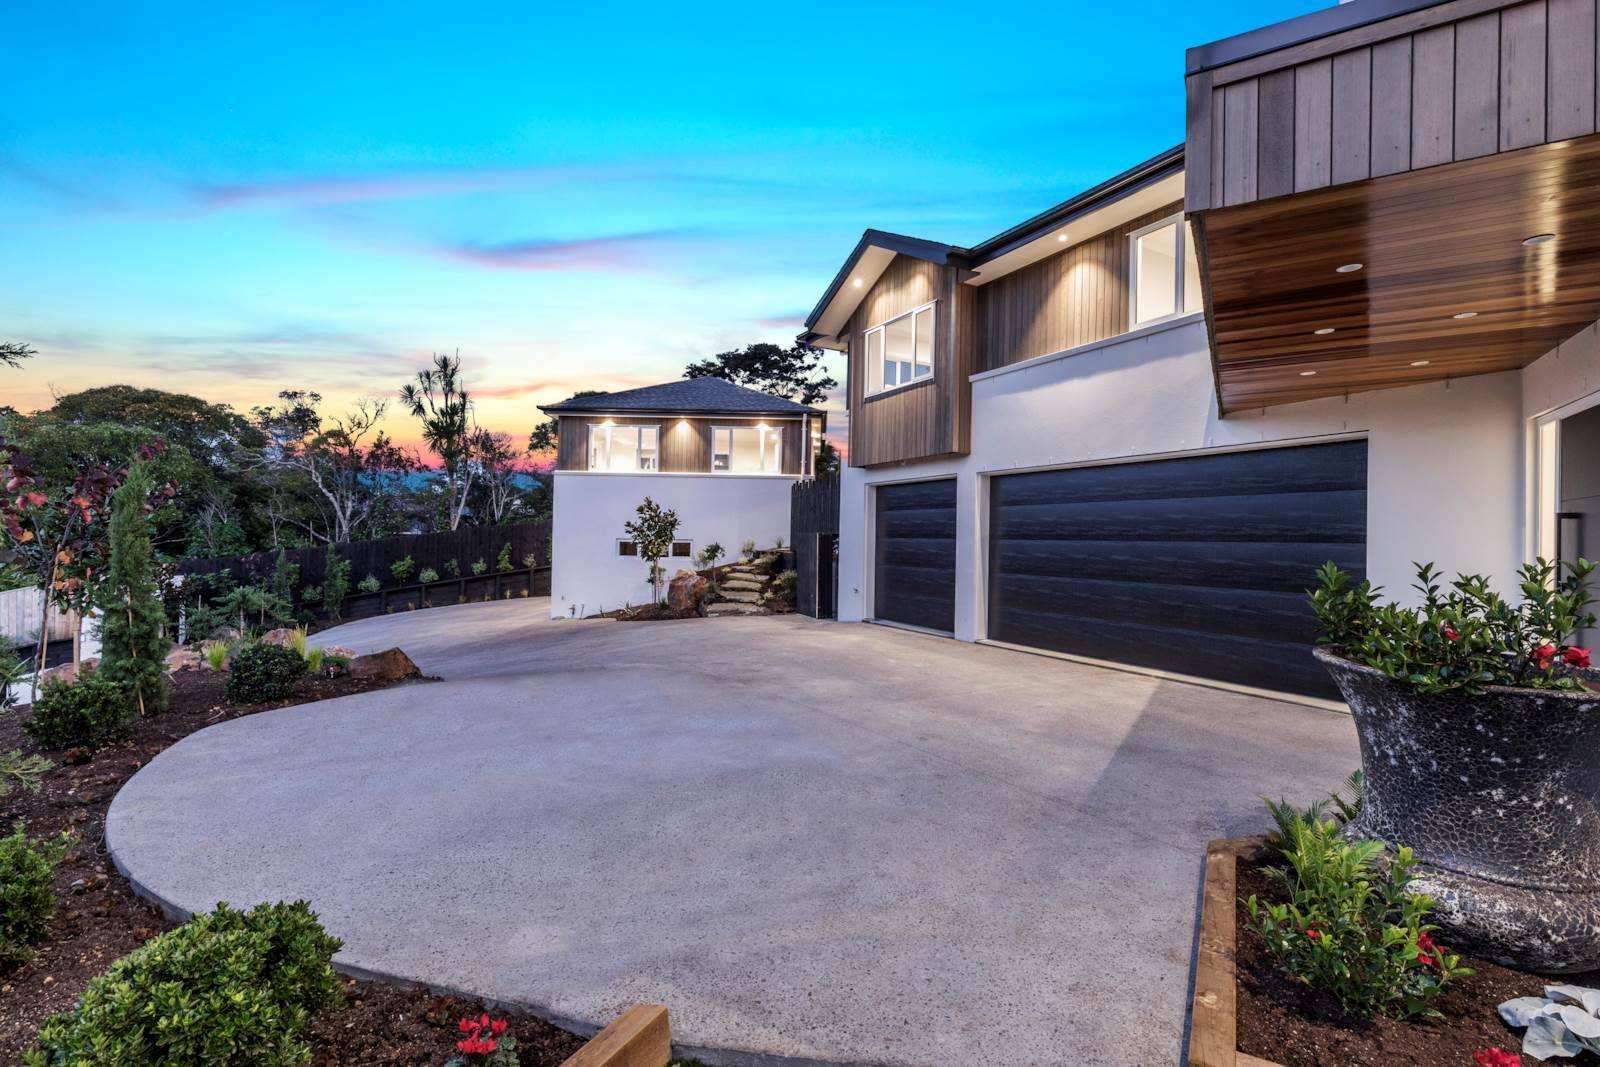 Greenhithe 6房 全新合法主屋+小住宅 视野美轮美奂 咫尺海滨&公园 一流地段铸就品质生活! Brand New - Legal Home & Minor - Top Quality